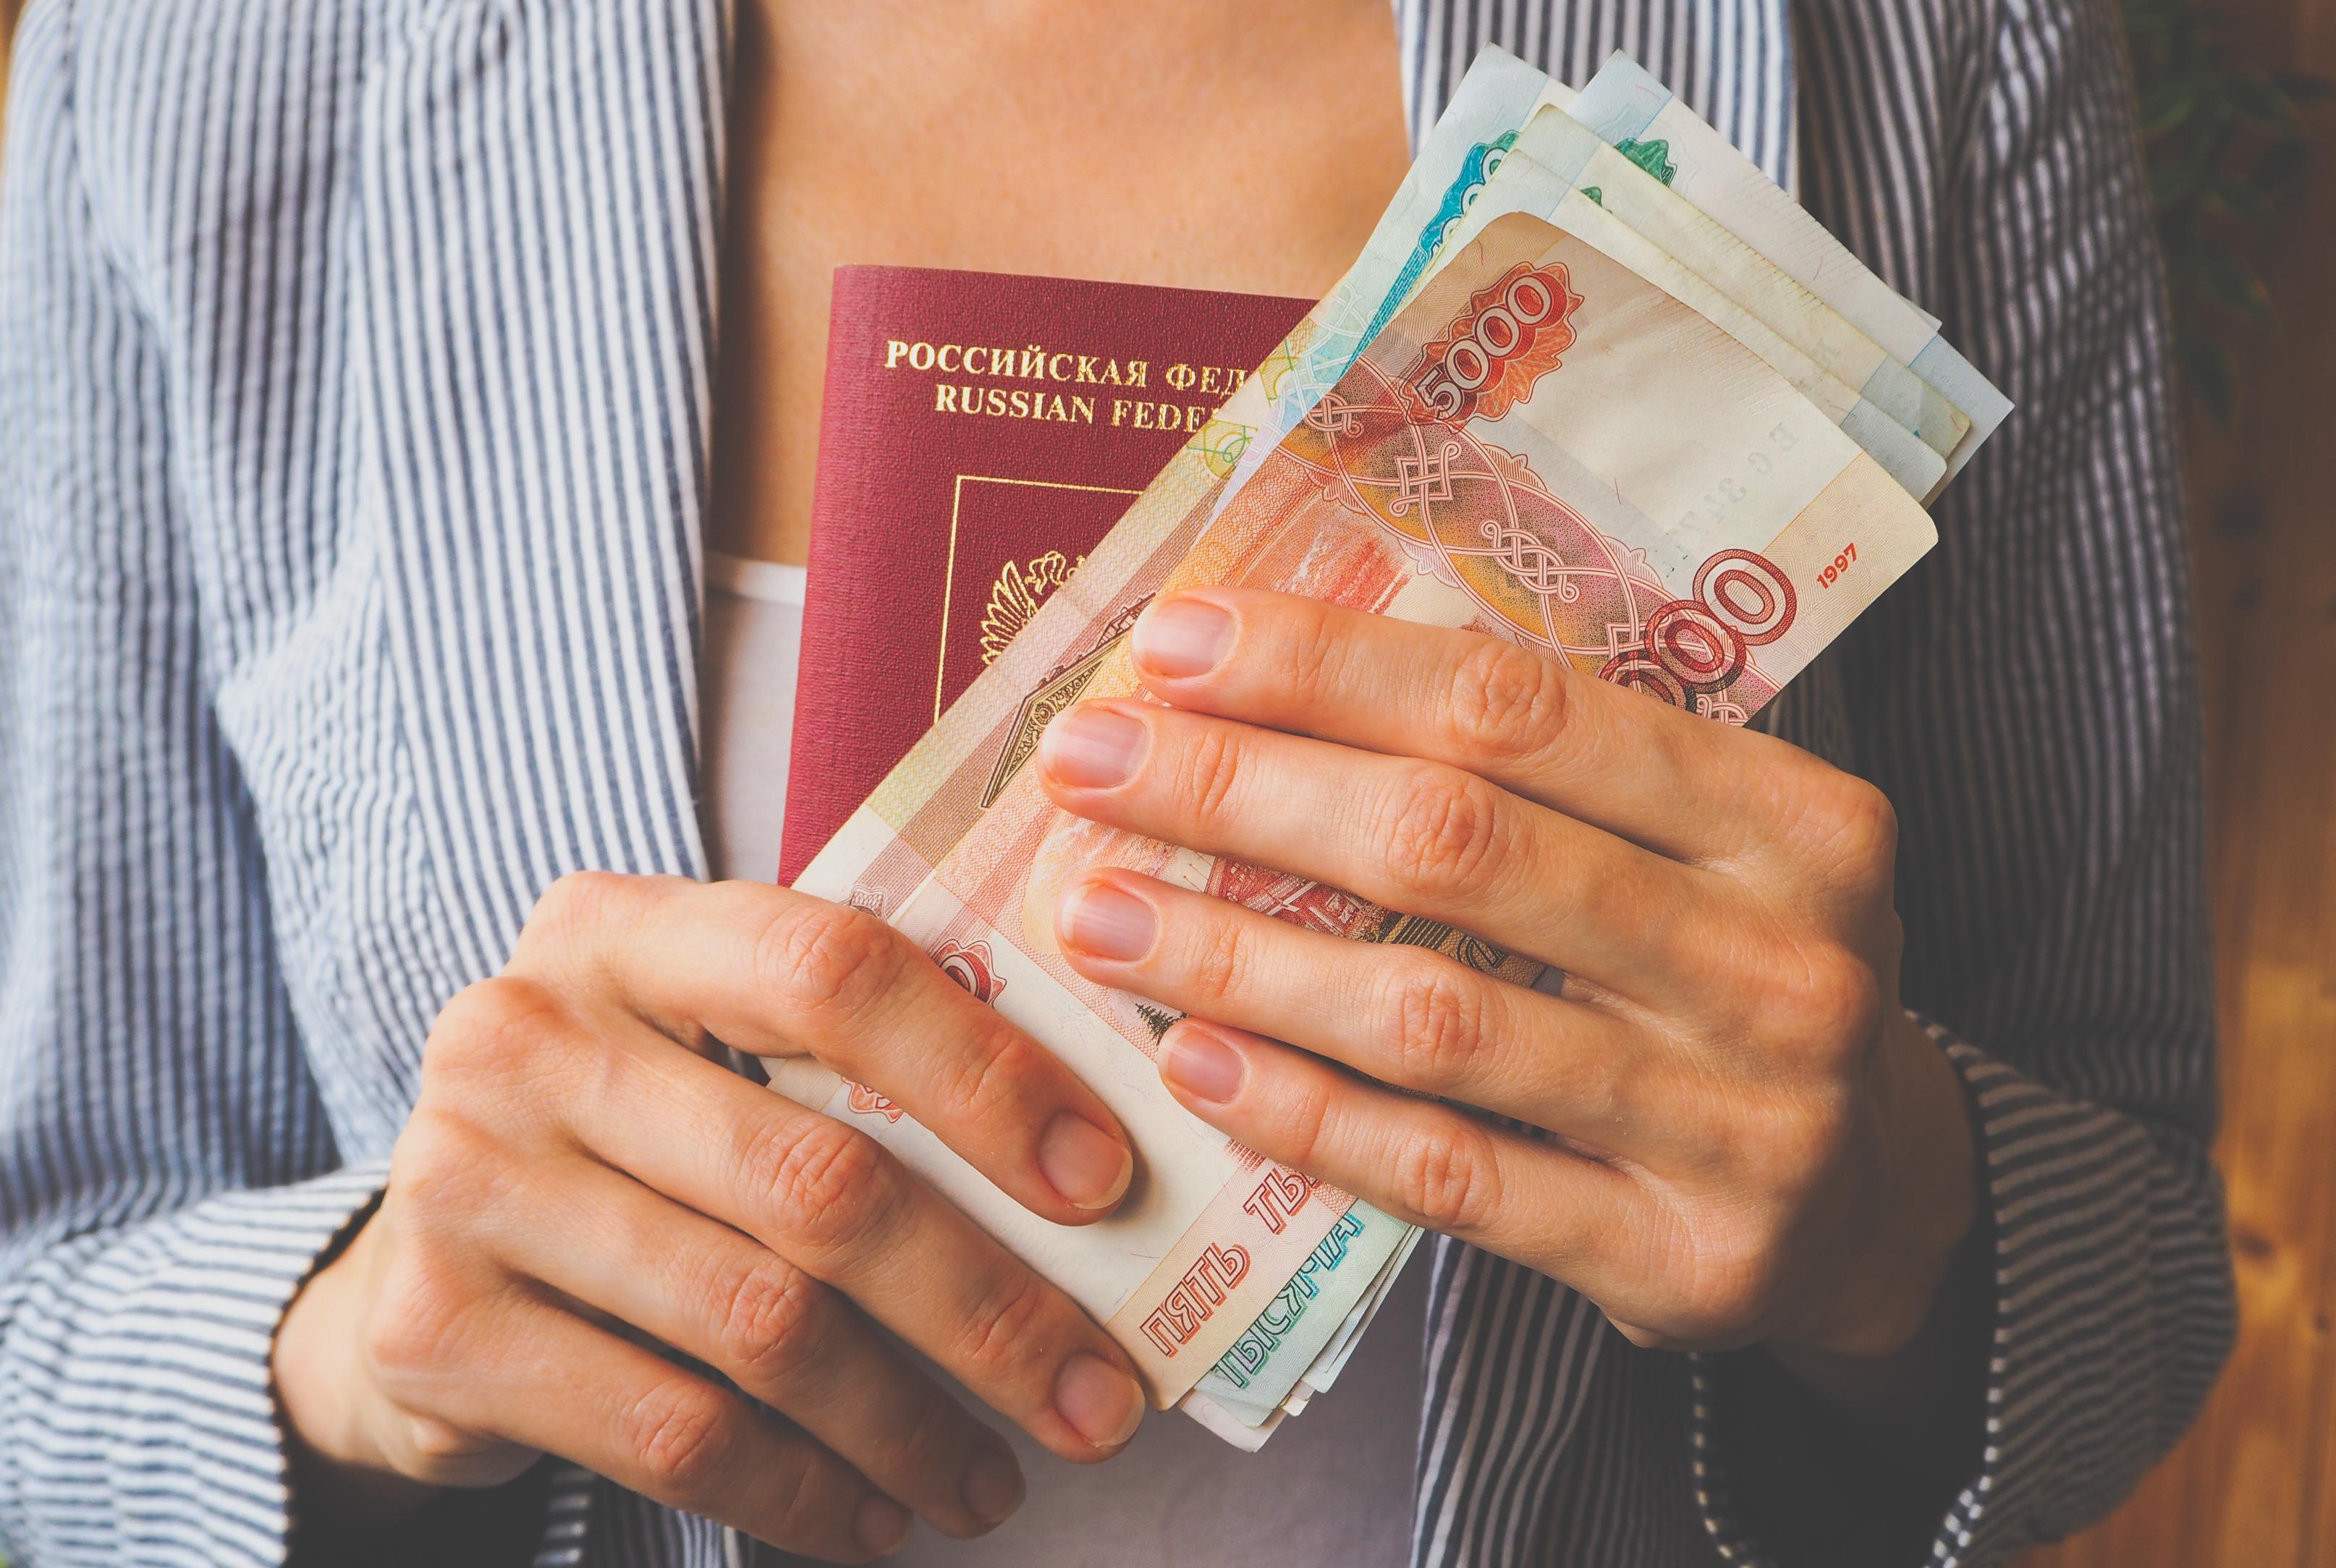 кредит на 500 000 рублей в сбербанке калькулятор онлайн 2020